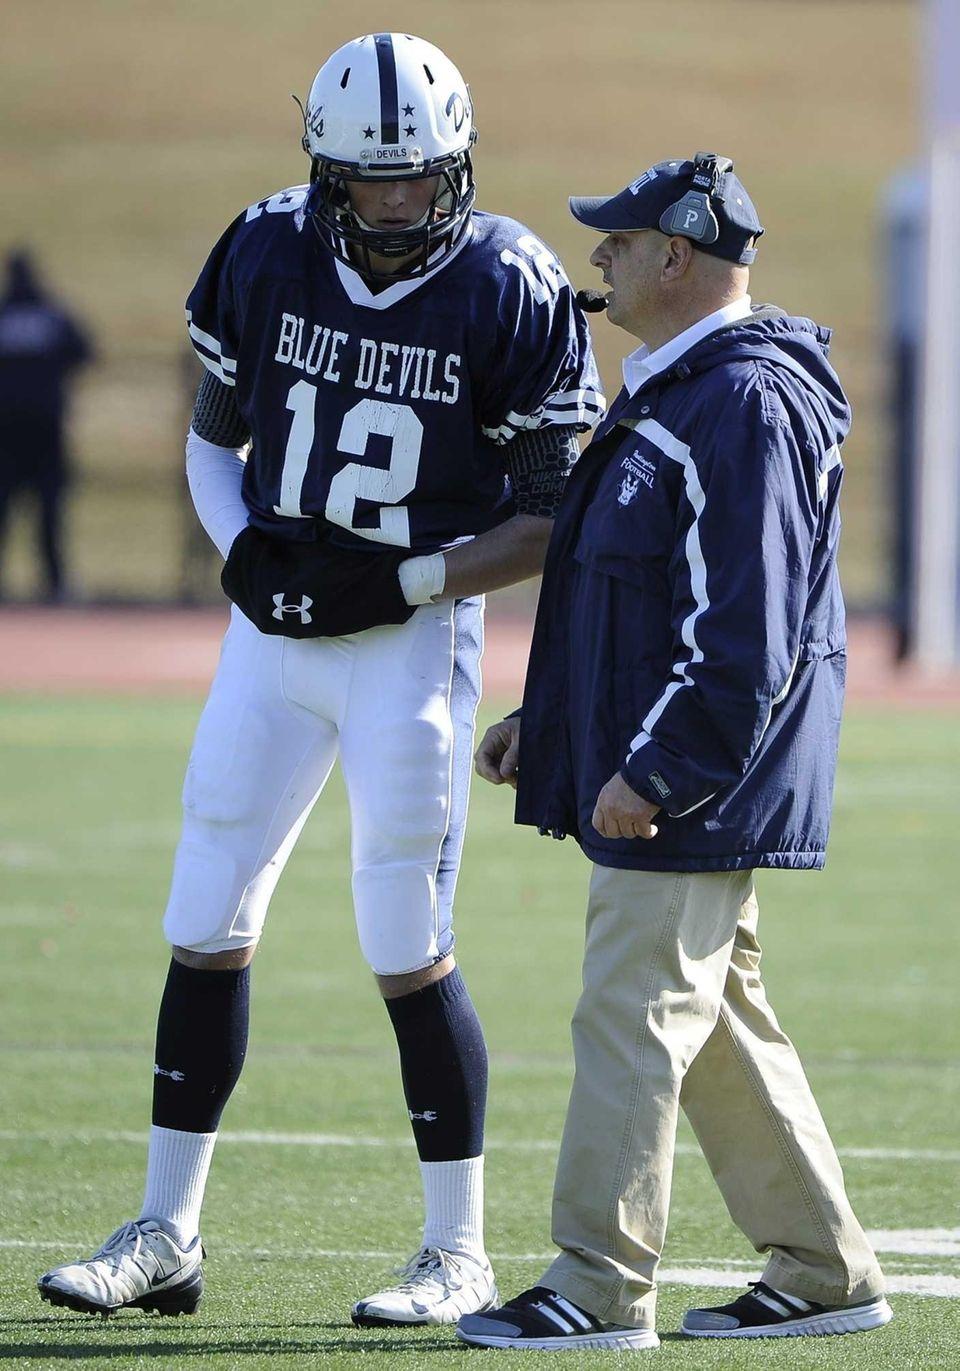 Huntington head coach Steve Muller directs quarterback Ben